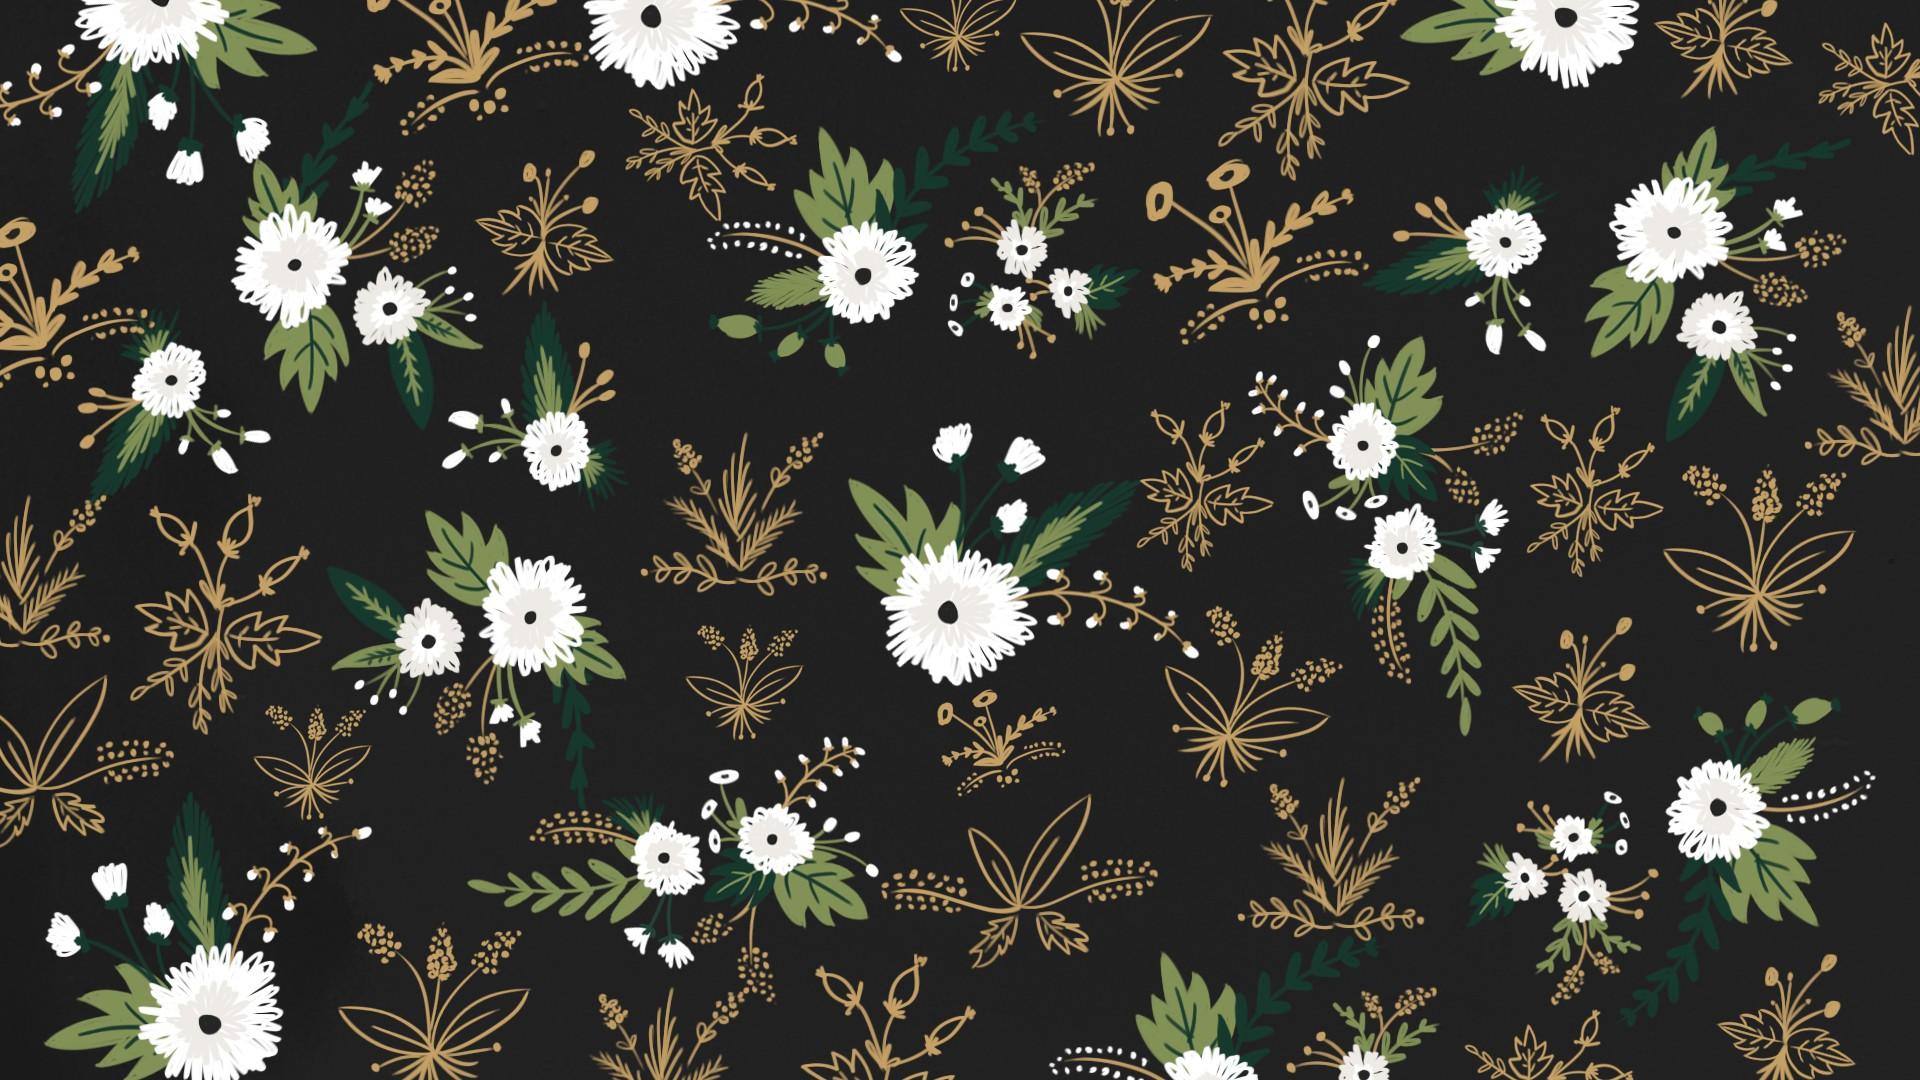 Floral desktop wallpaper ·① Download free cool full HD ...